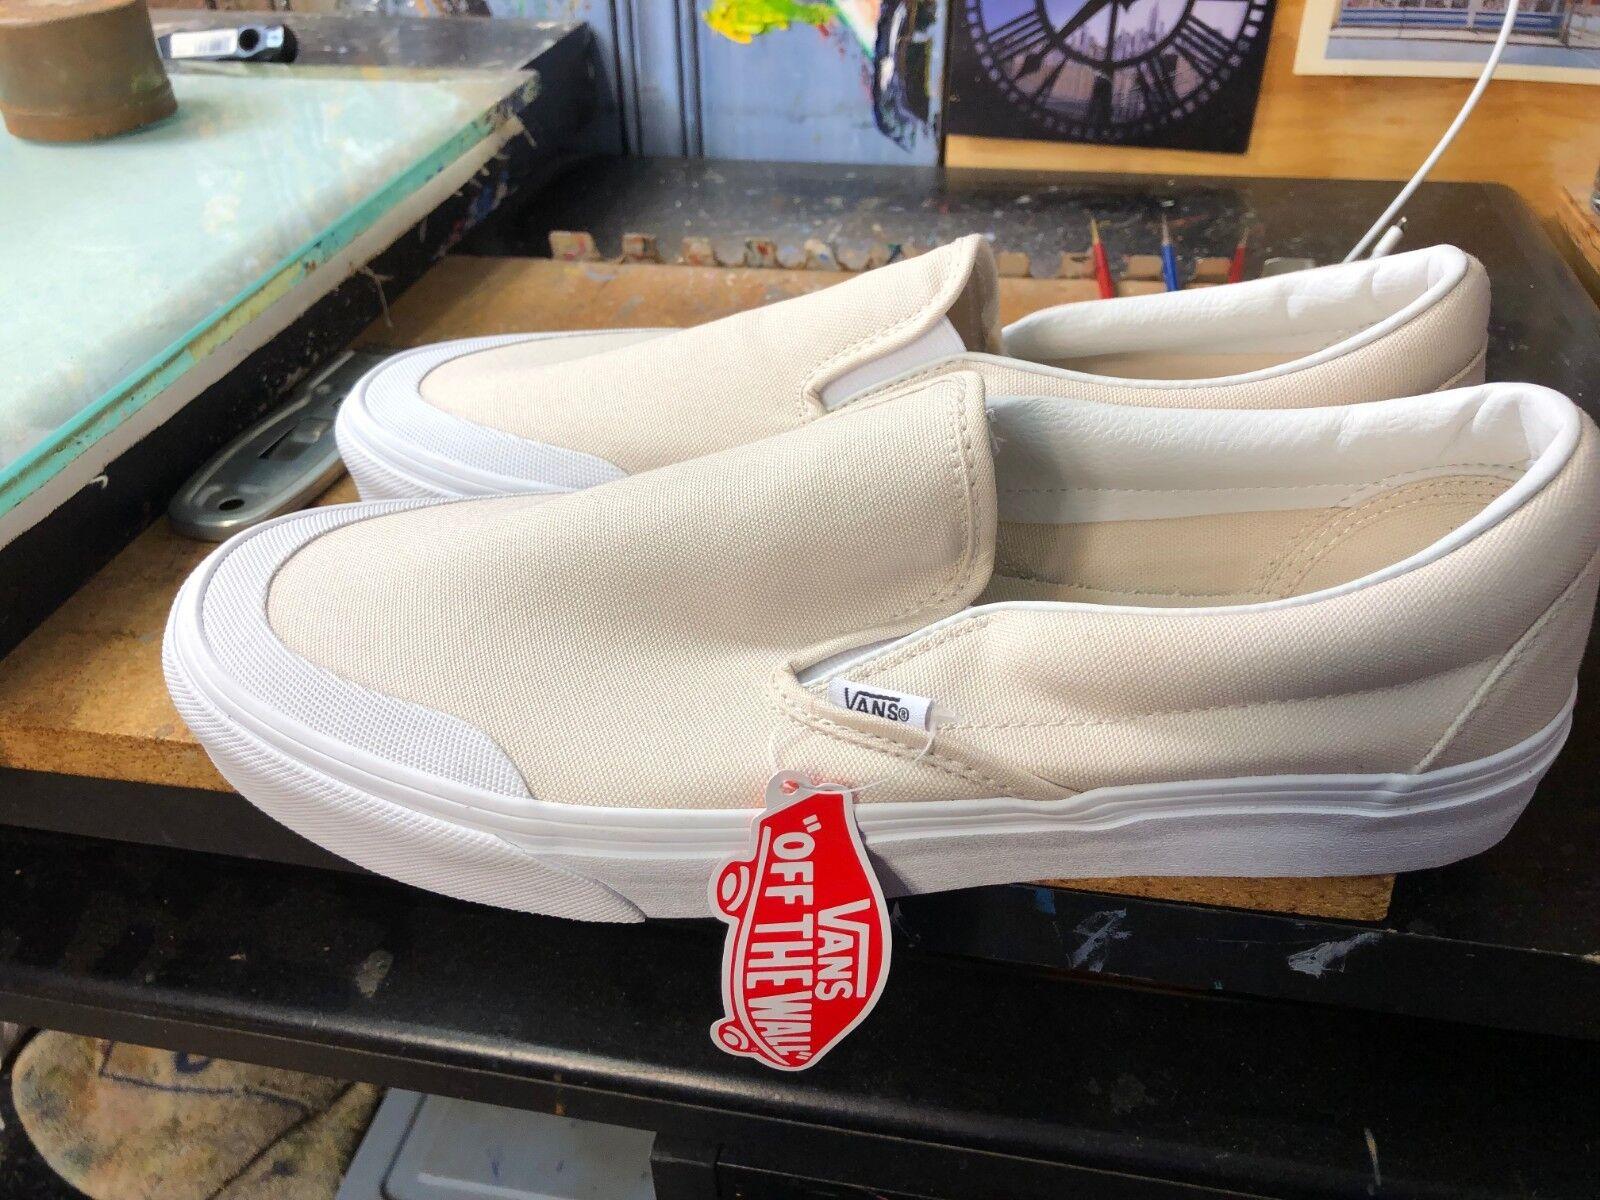 7ae634f50f797e Vans CLASSIC SLIP-ON SLIP-ON SLIP-ON (CANVAS) MOONBEAM Toe Cap Size ...